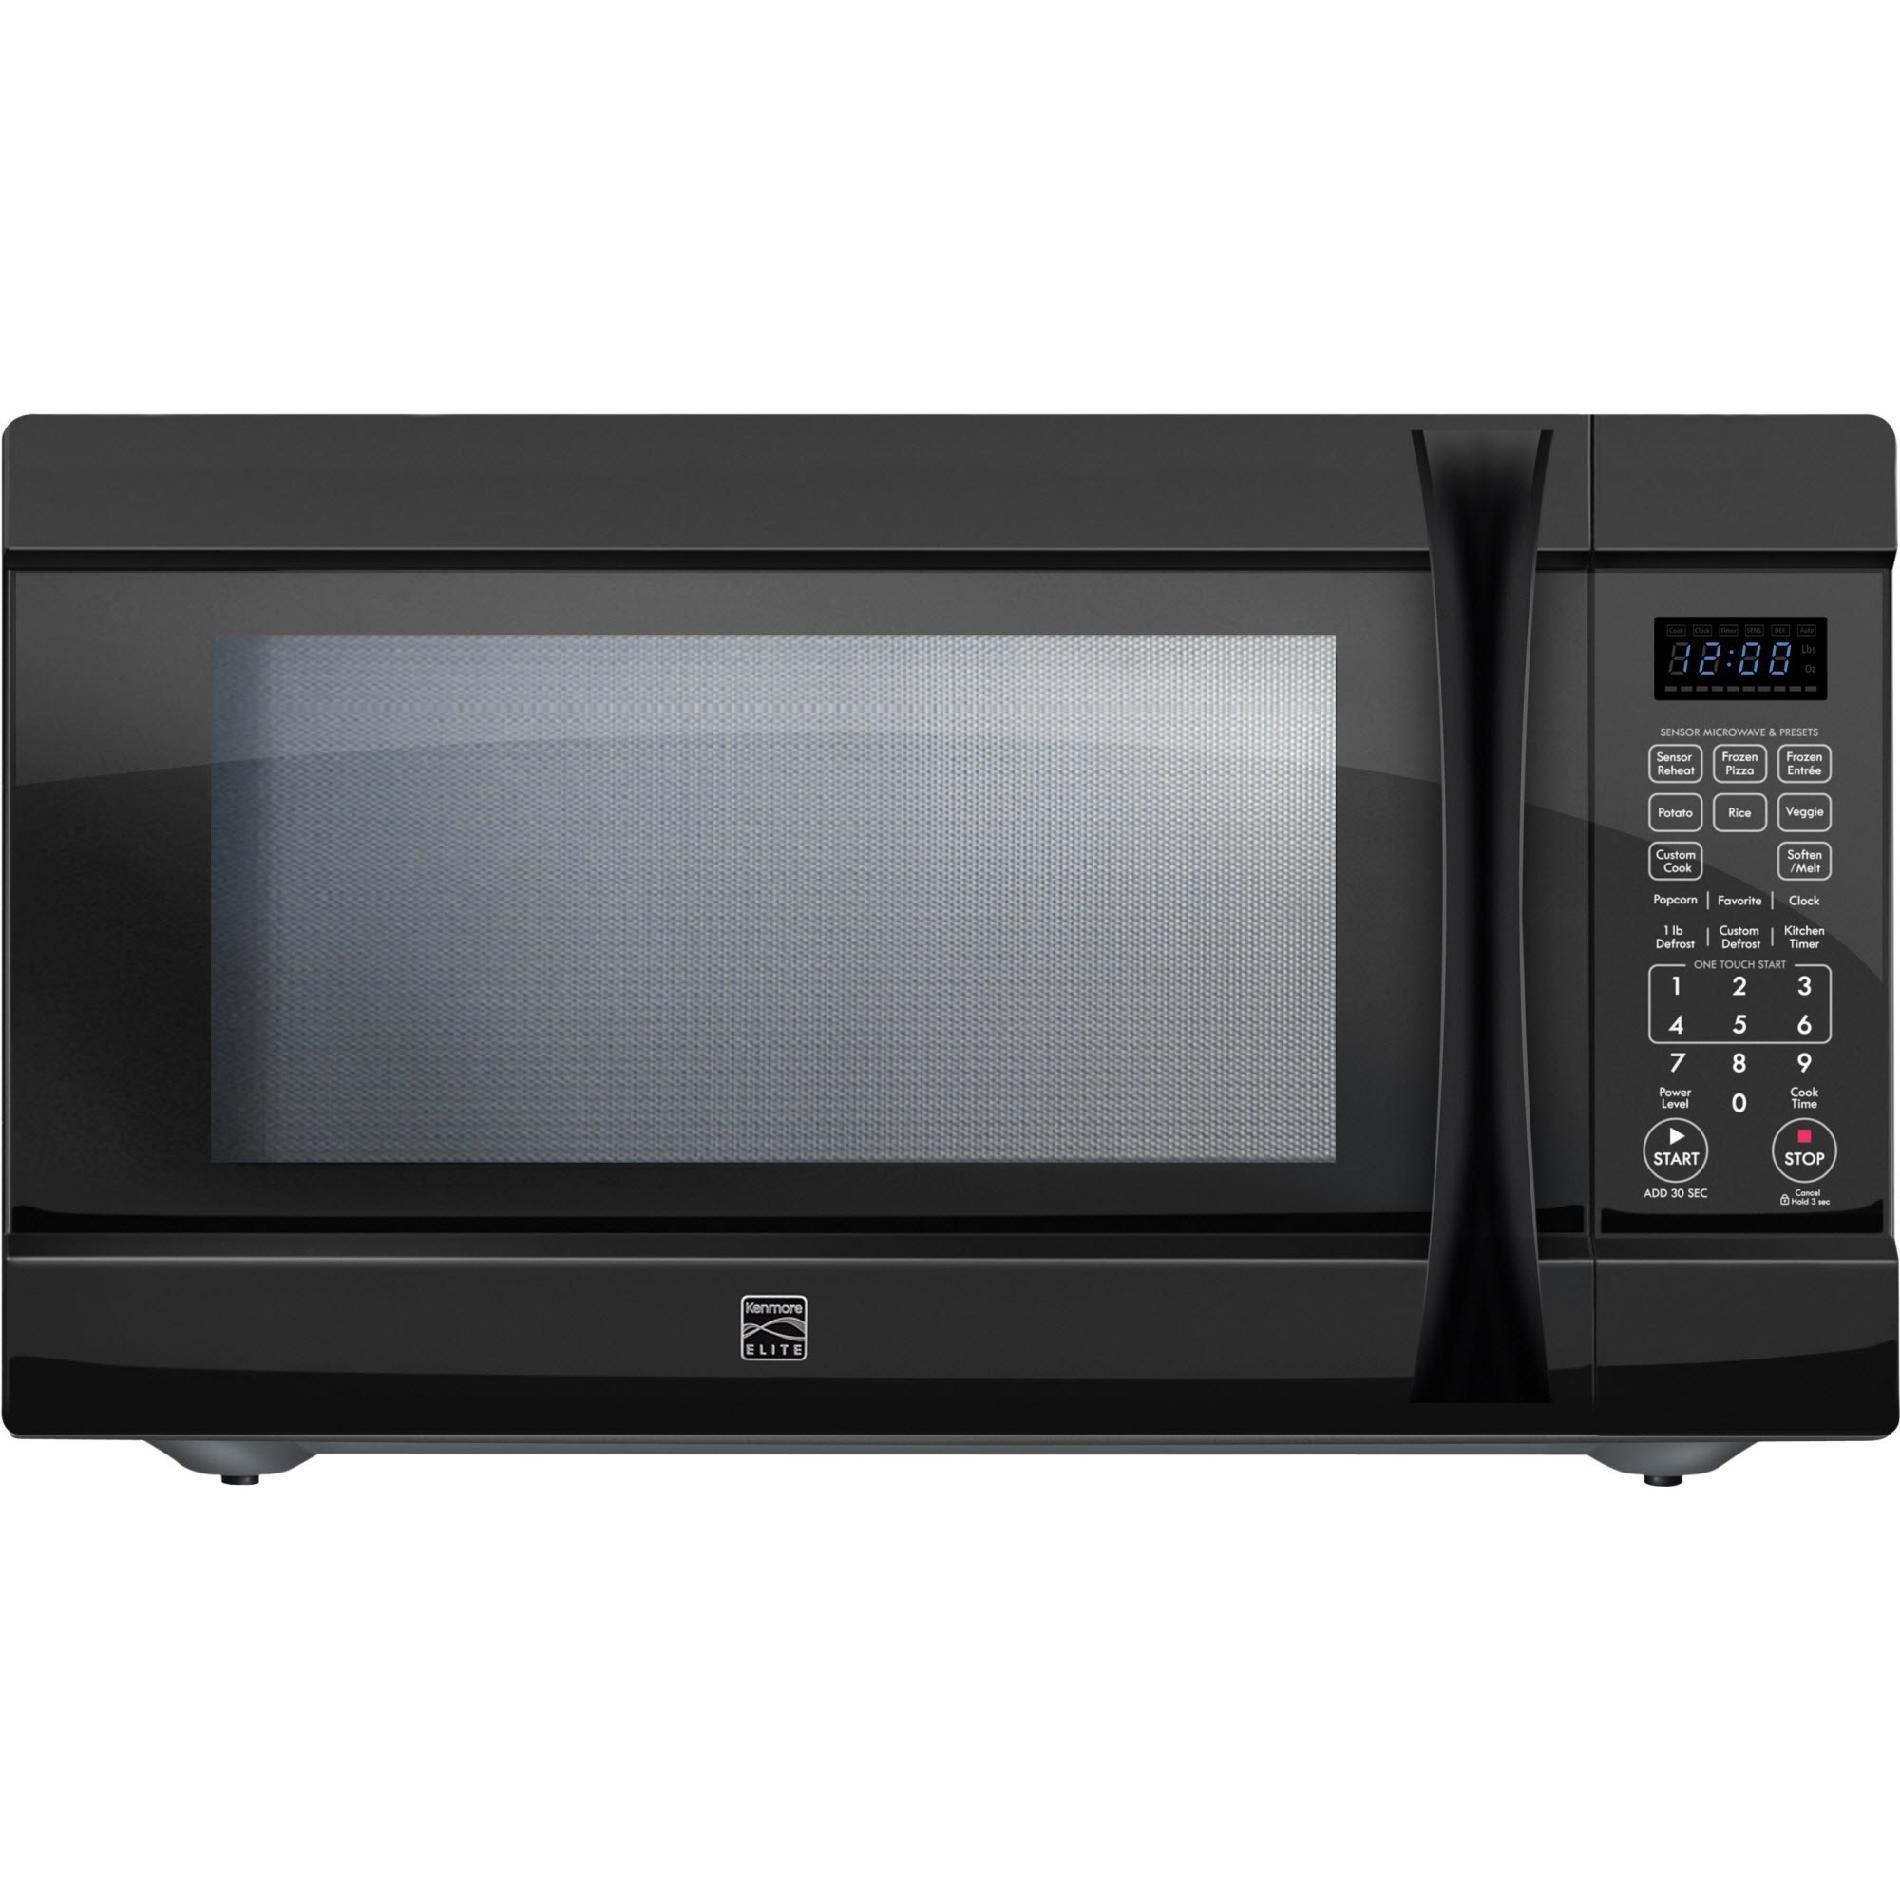 Kenmore Elite cu ft Countertop Microwave w ExtraLarge